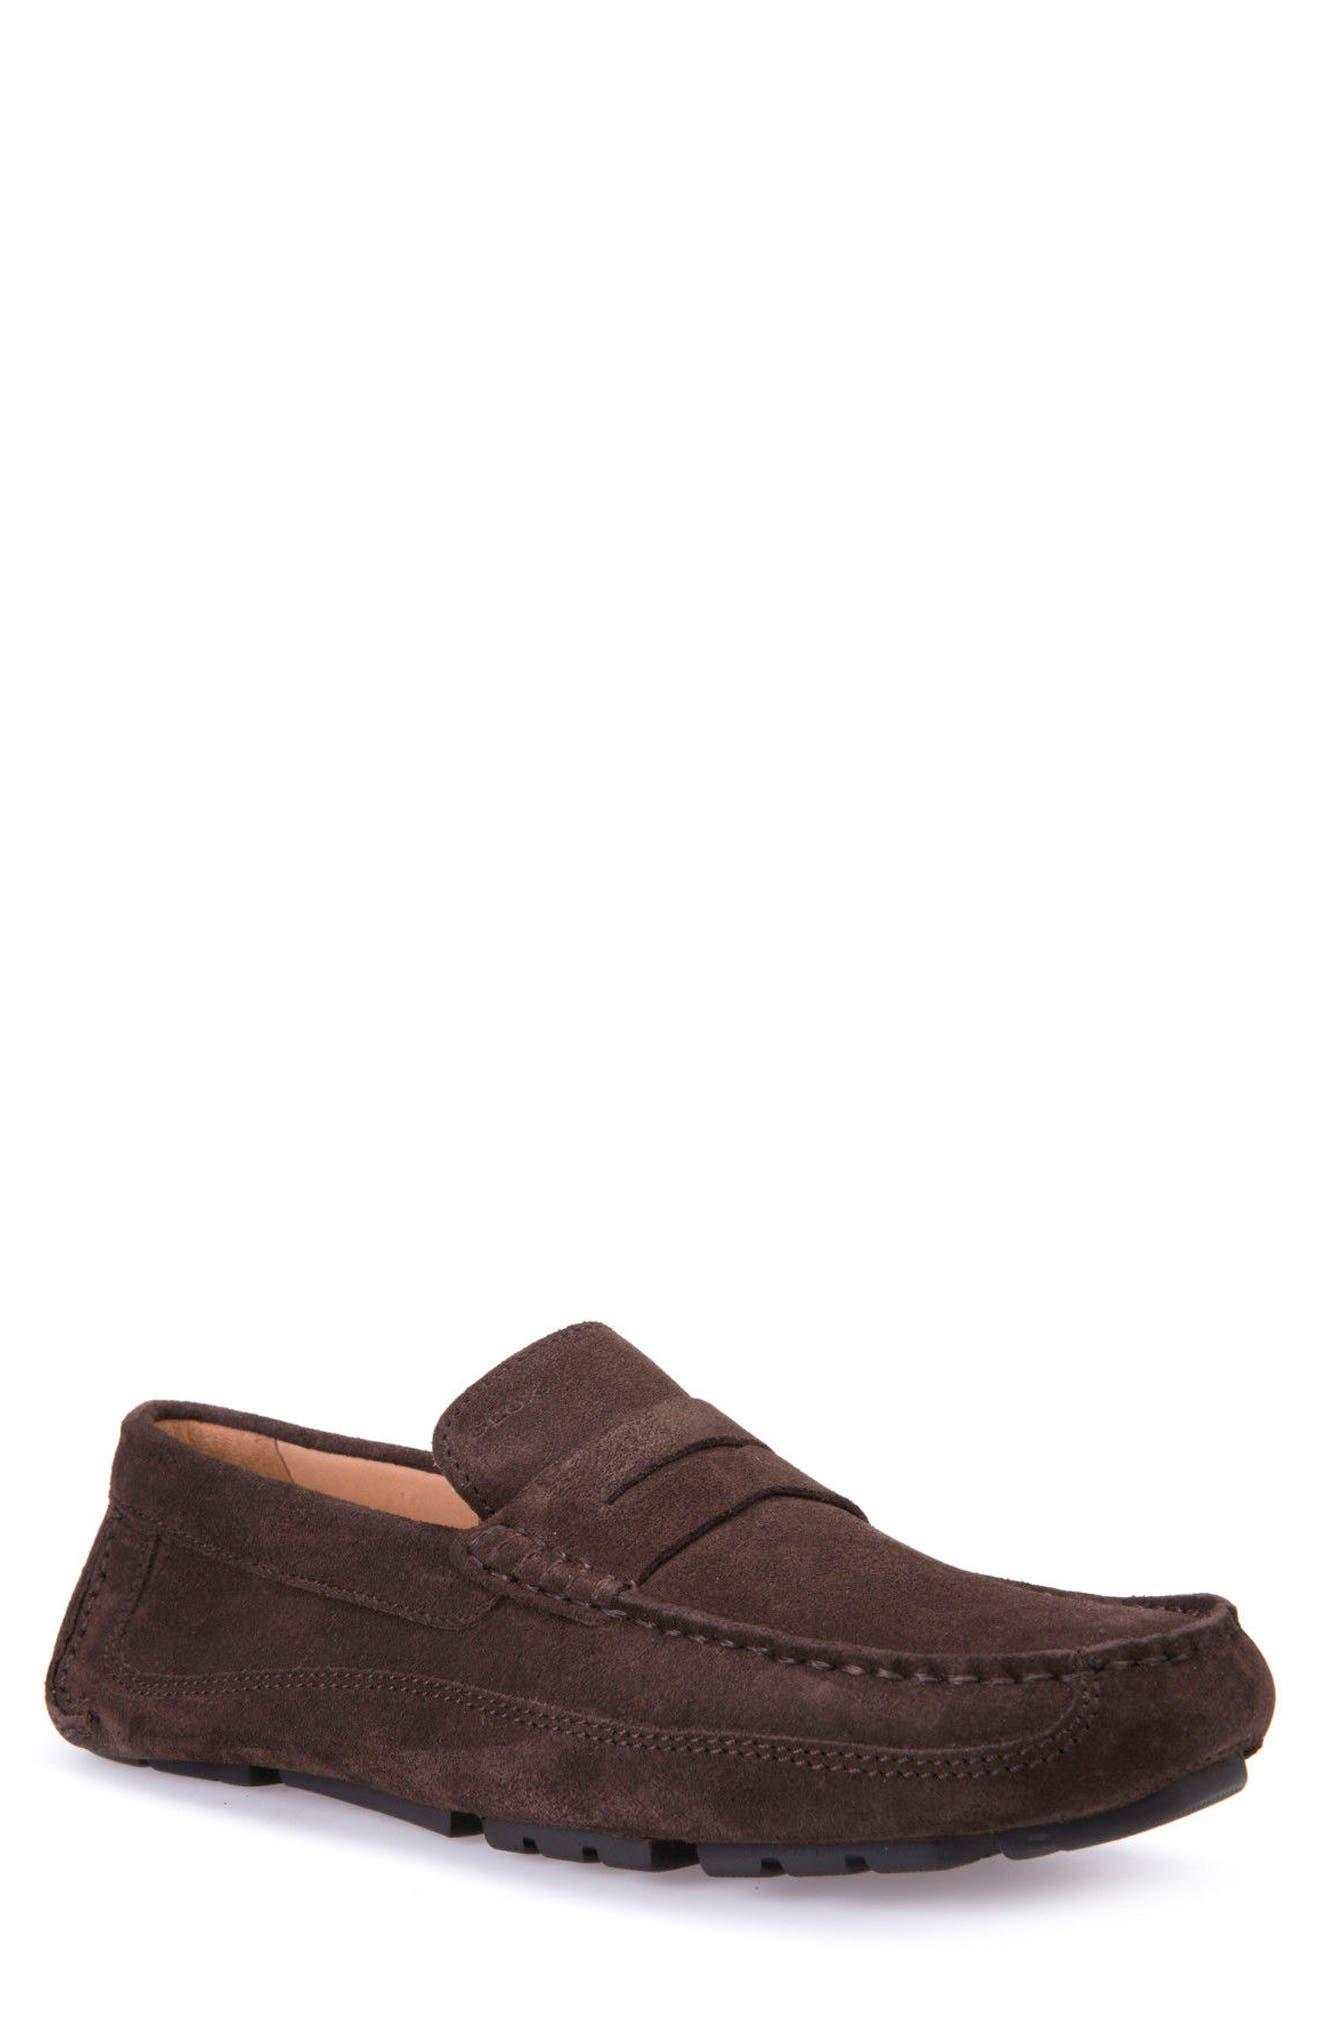 Geox Melbourne 1 Driving Shoe (Men)